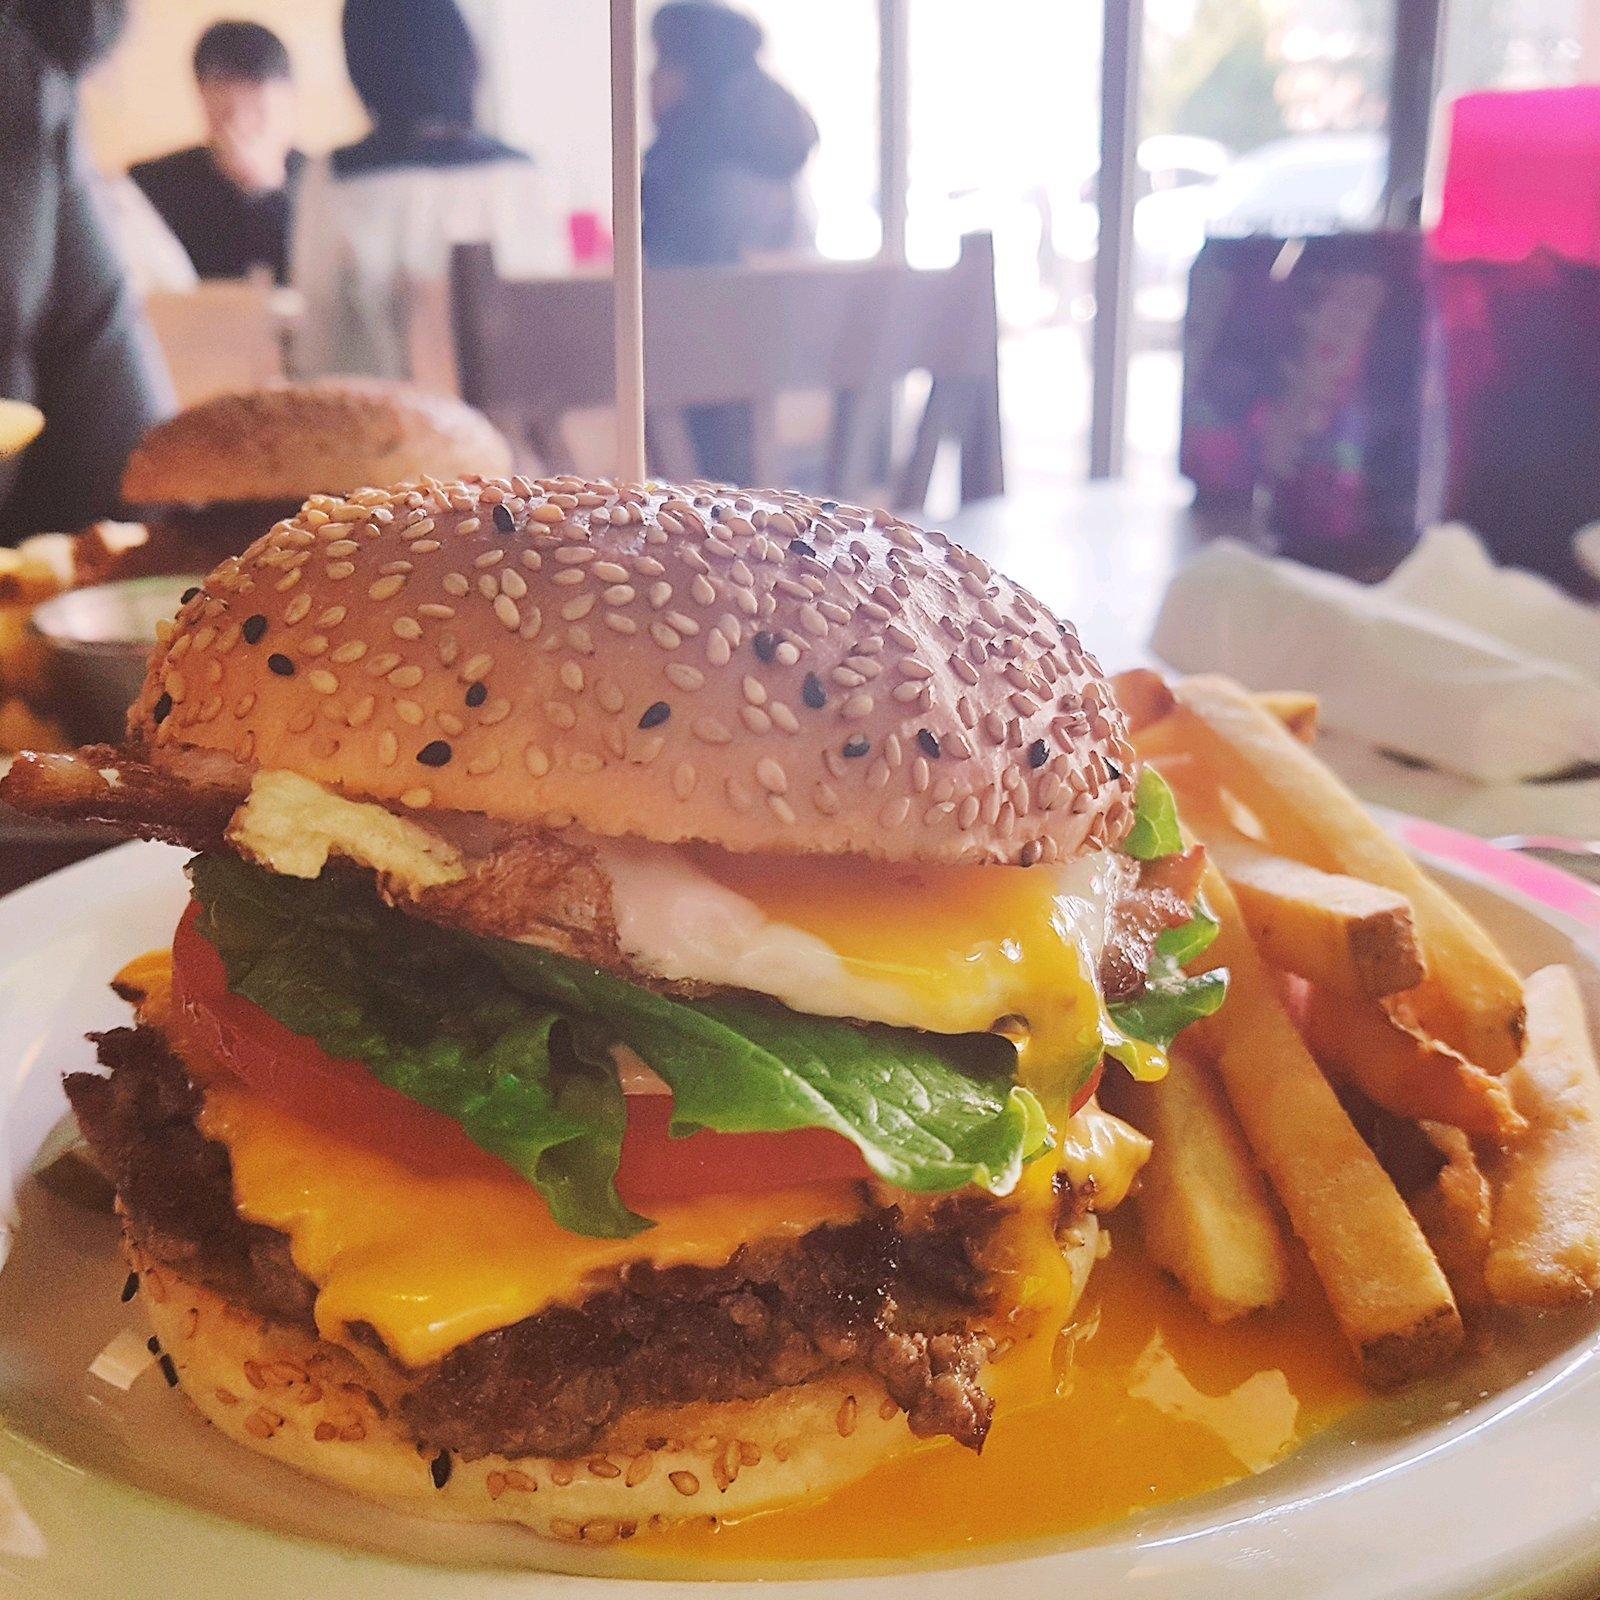 Gilbert's Burger & Fries Pictures - 1545-5, Seocho-dong, Seocho-gu, Seoul